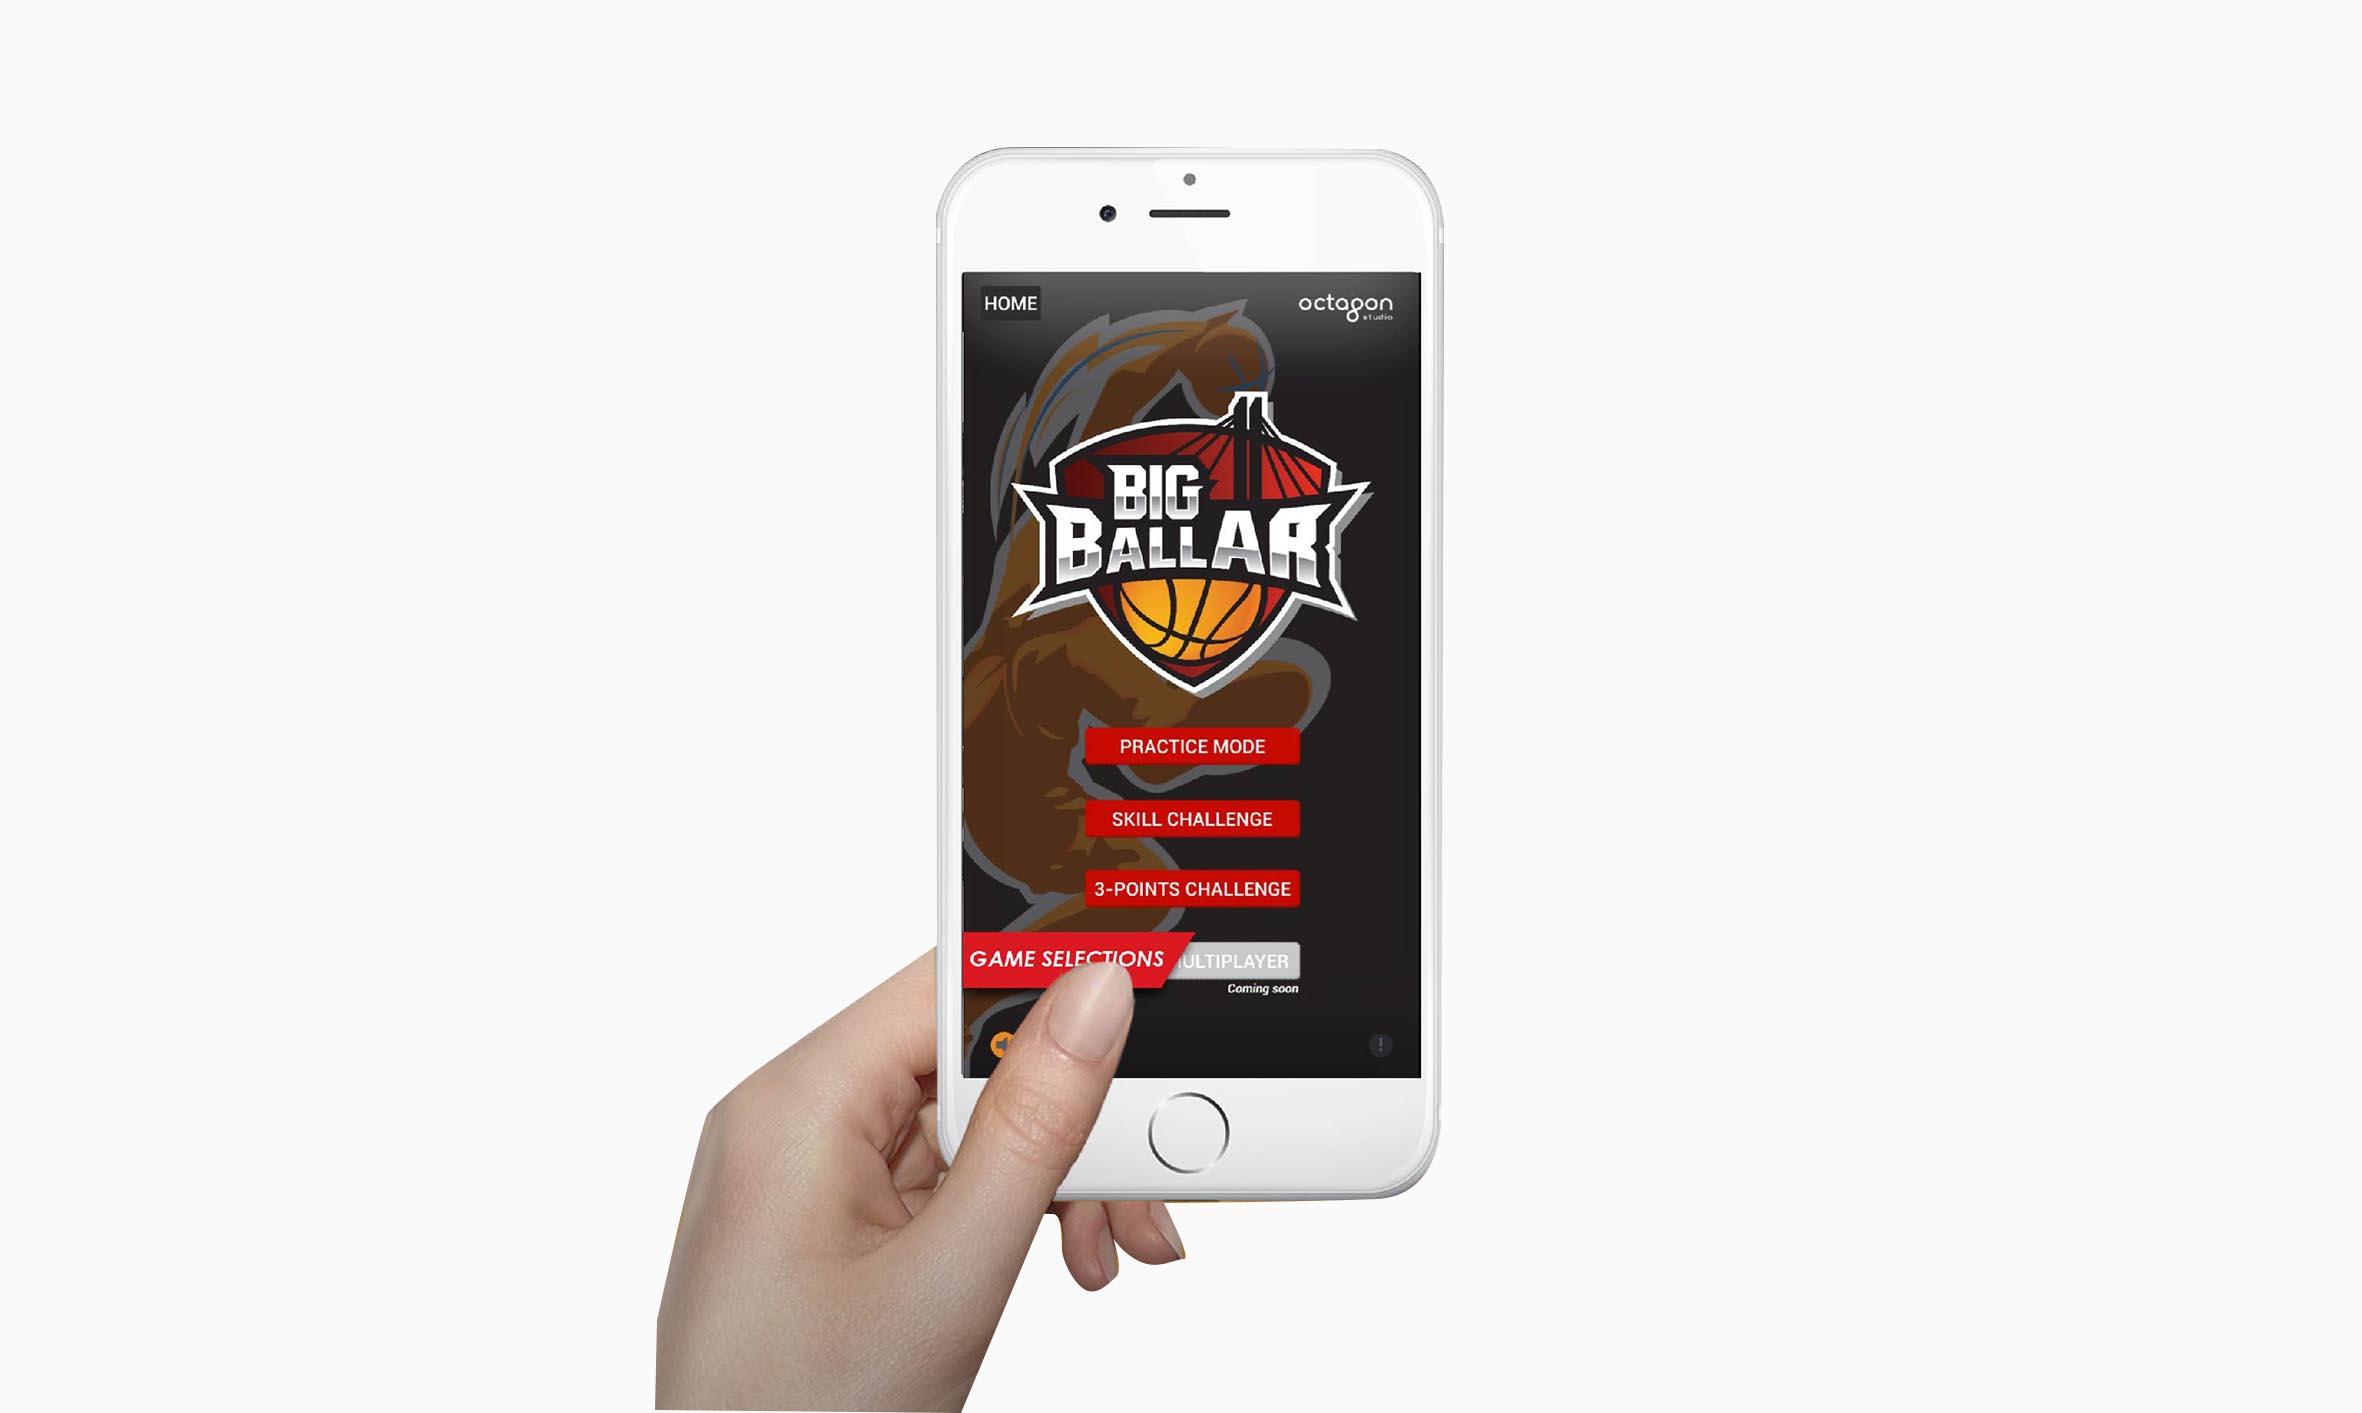 BigBall AR App